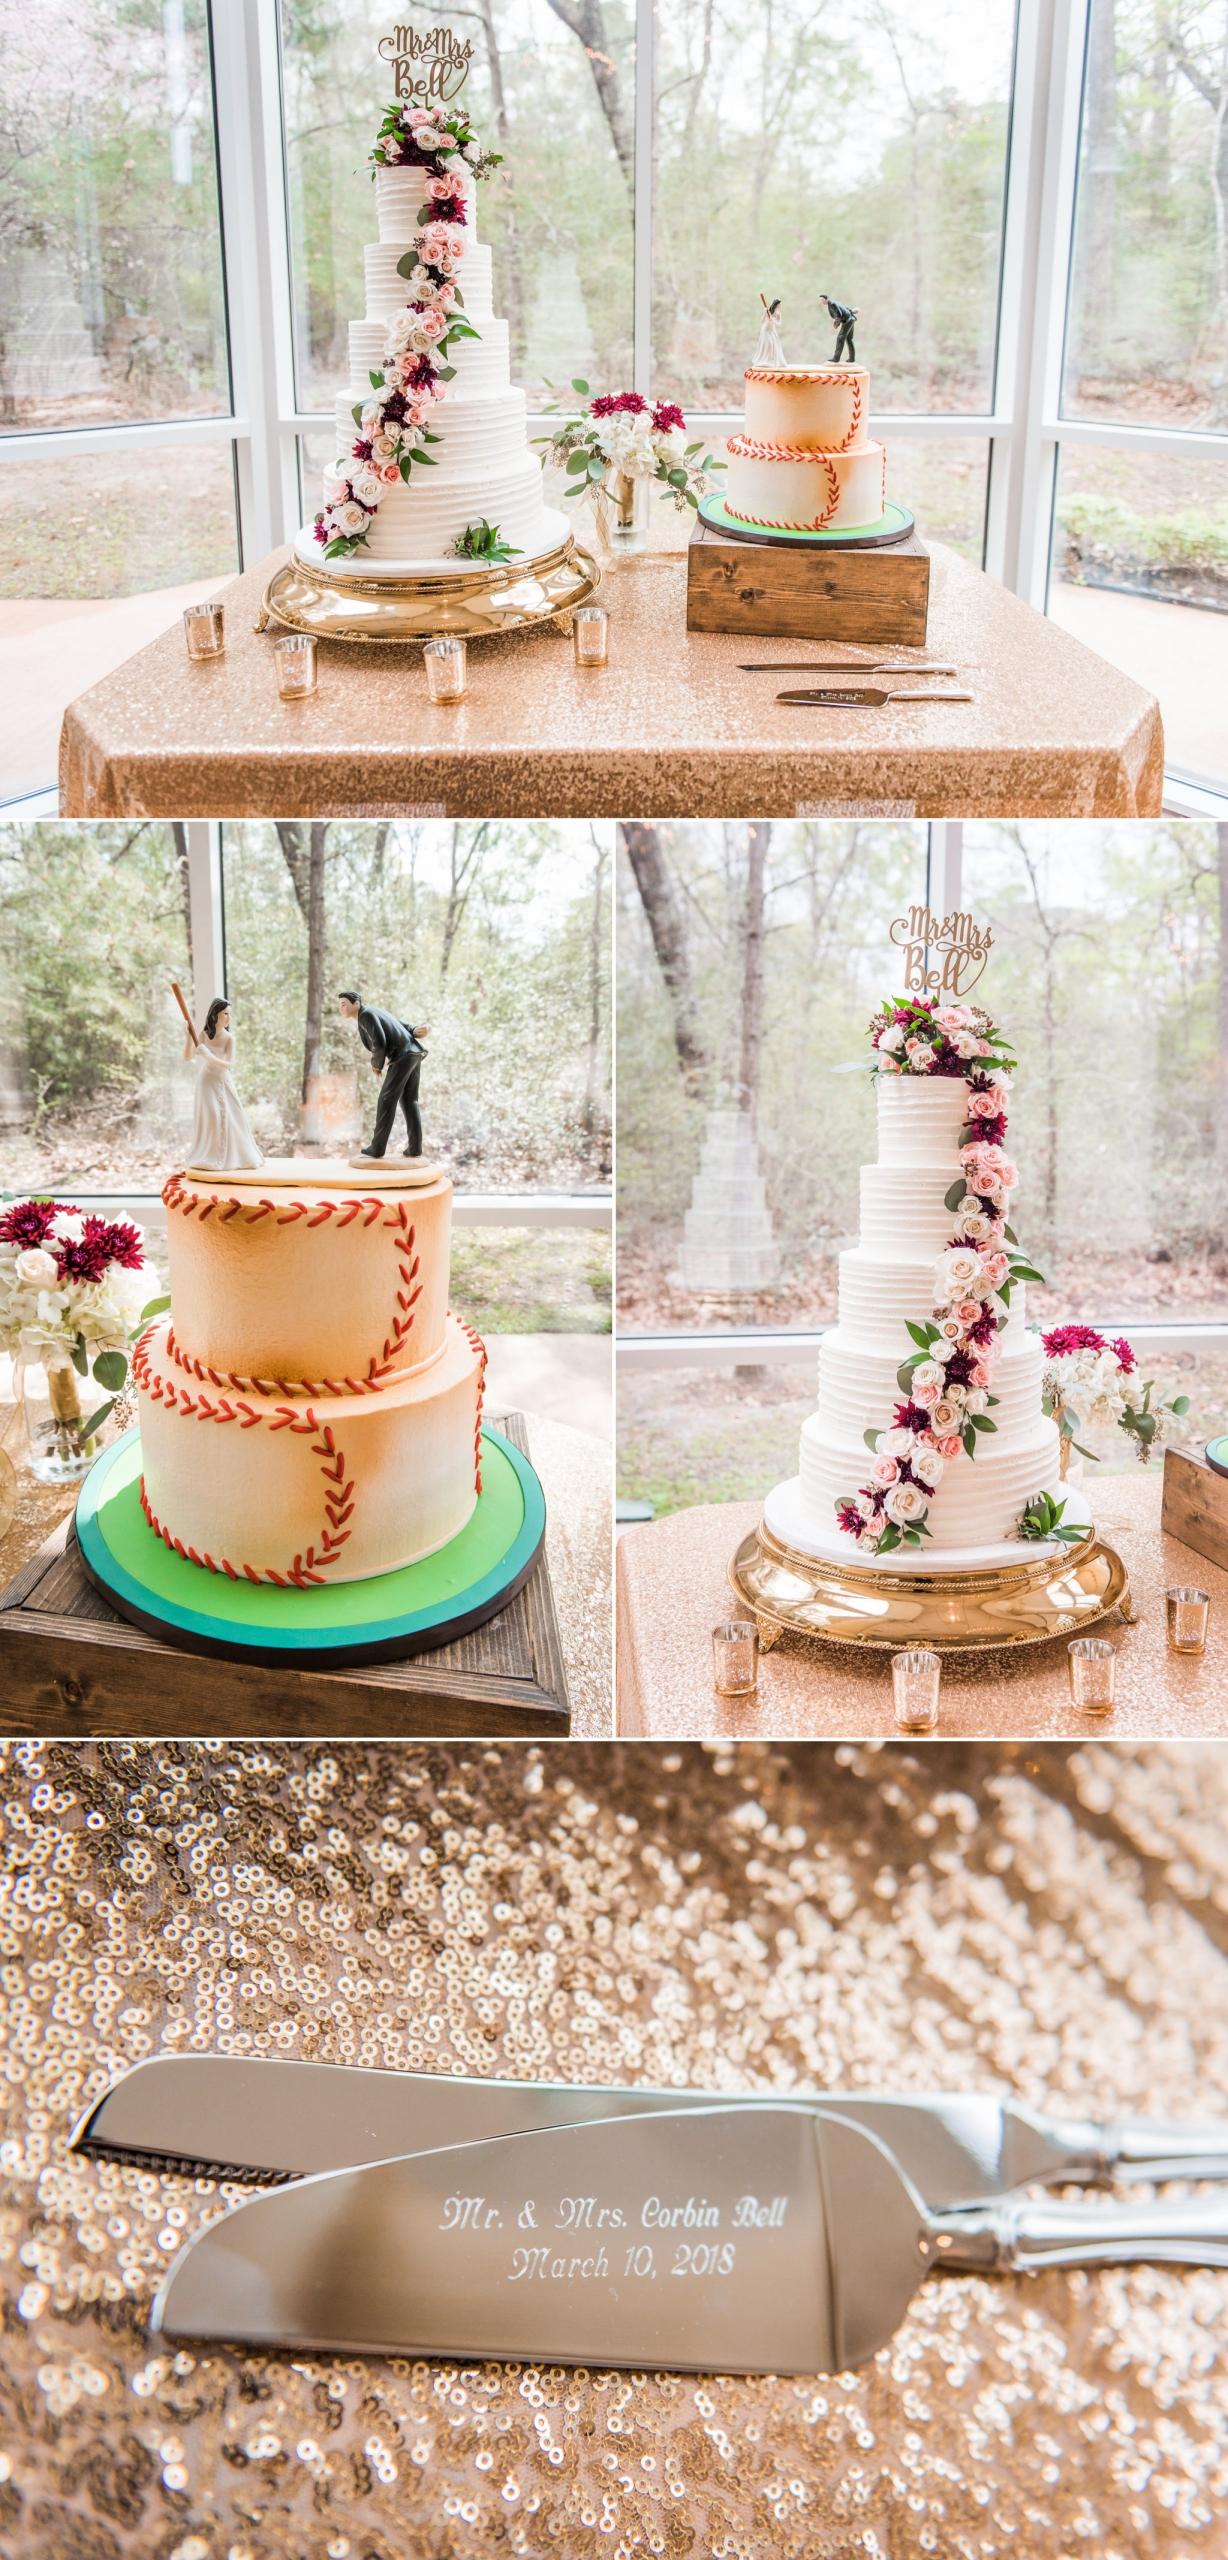 Ashton Gardens North Wedding Cake